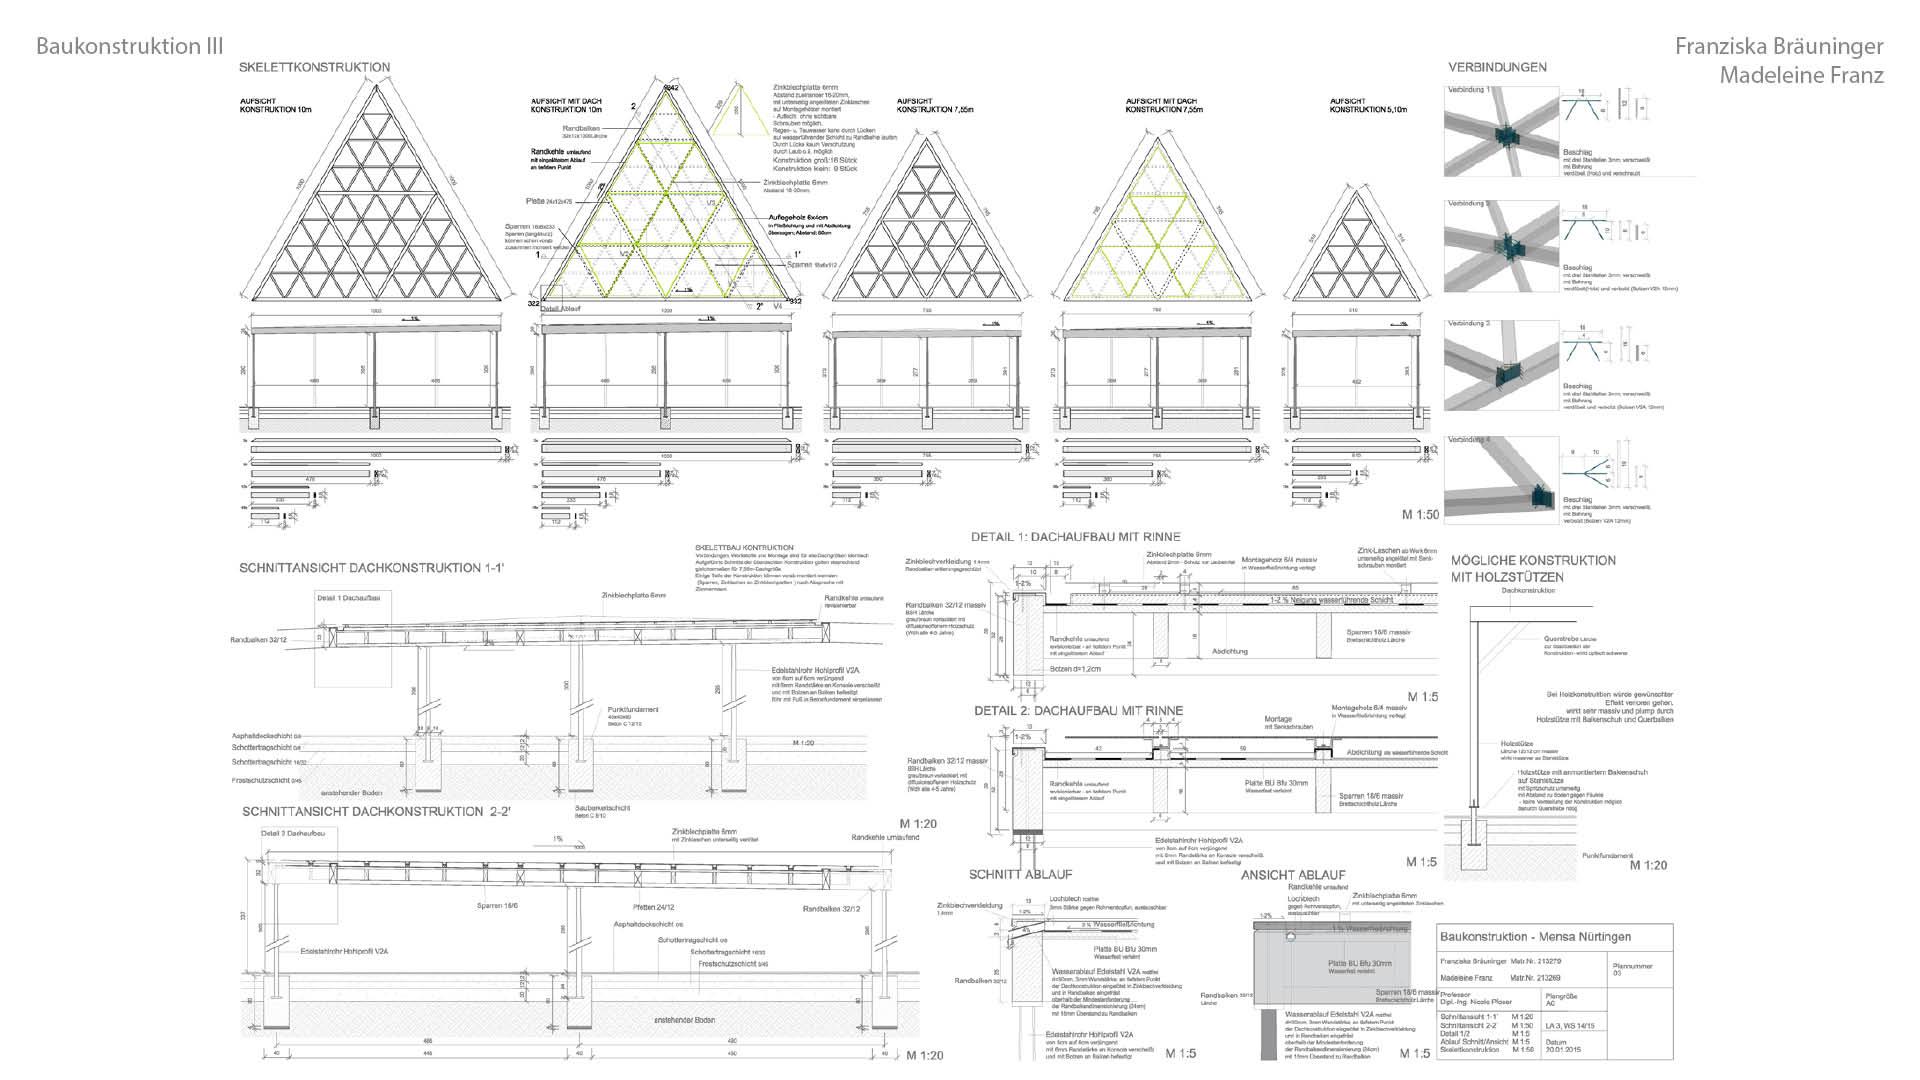 03 14 03 Baukonstruktion III